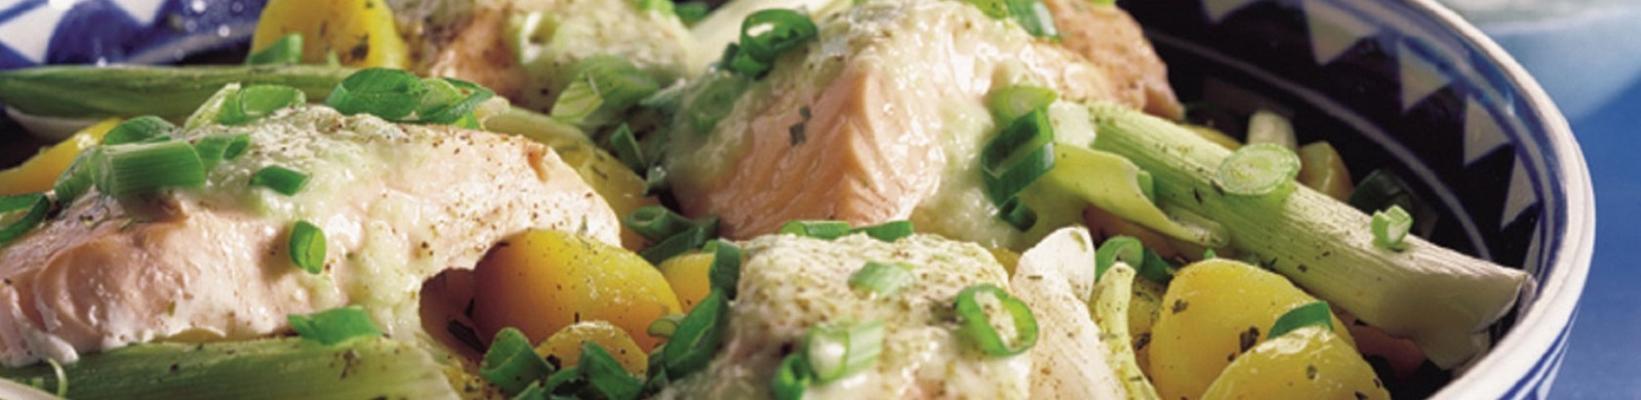 salmon with potatoes, leek and cucumber sauce